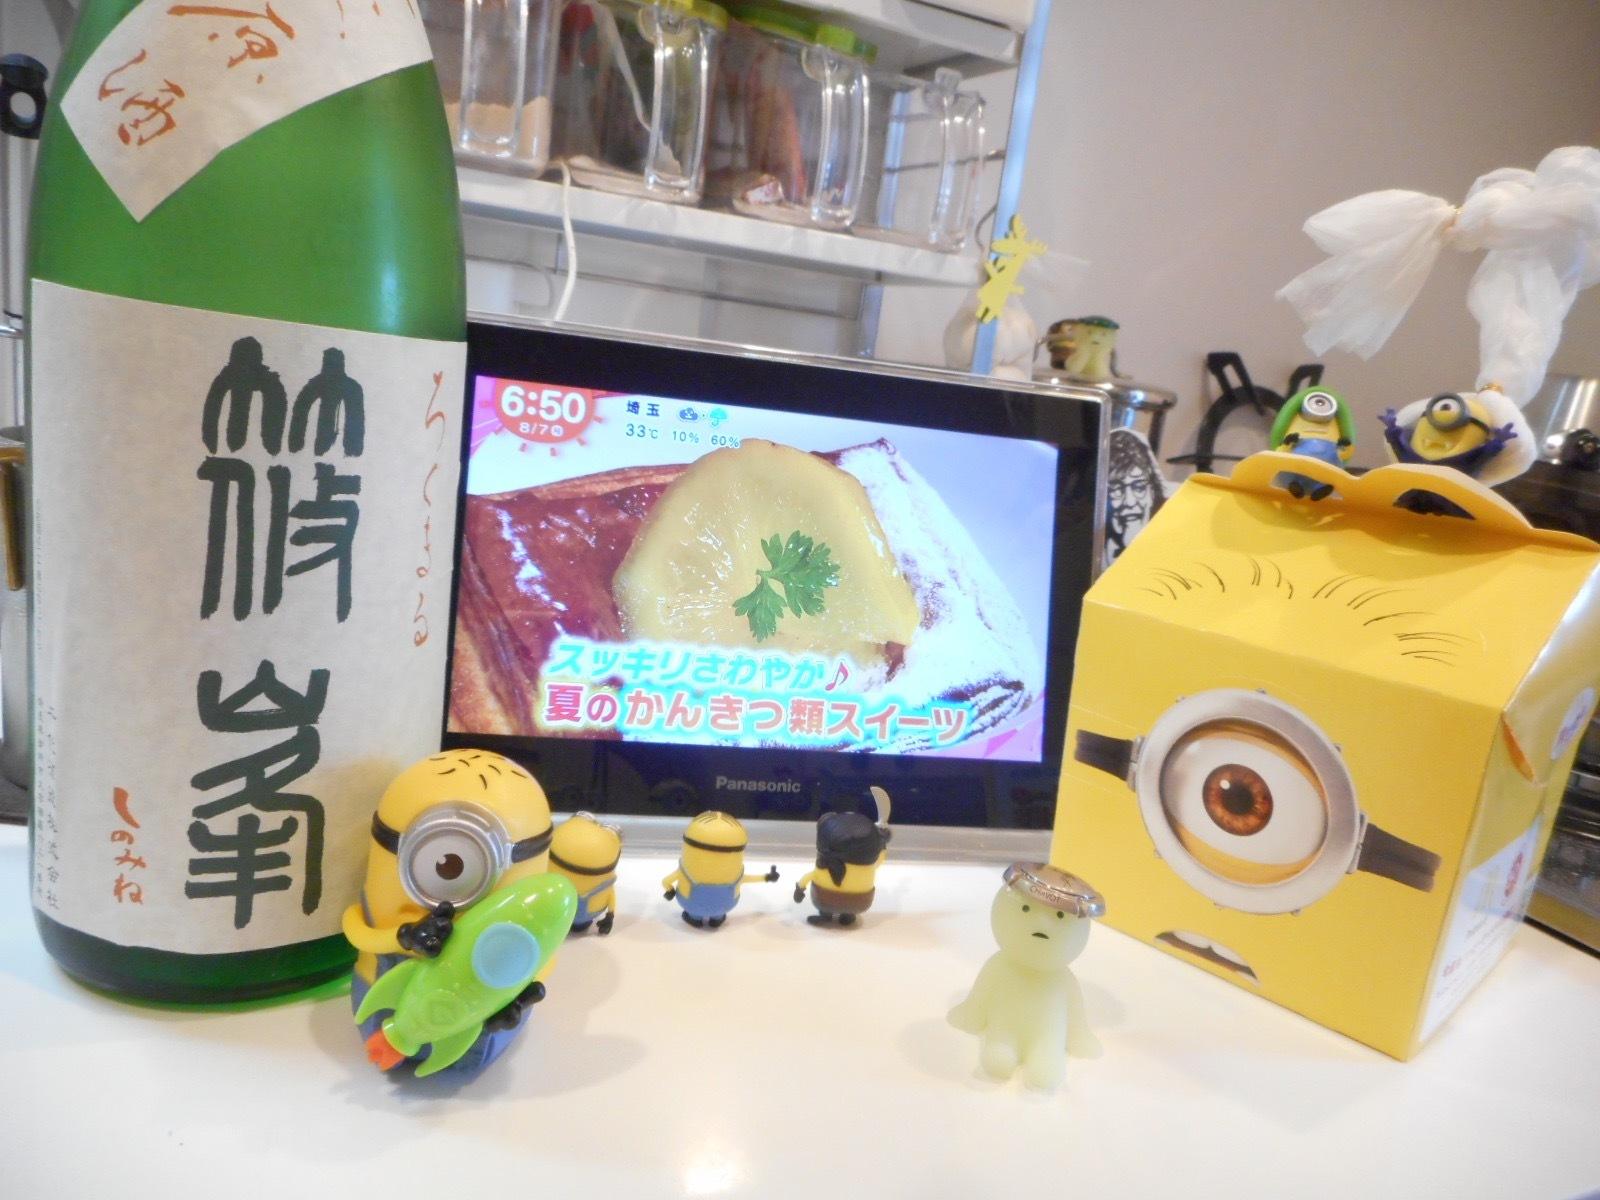 rokumaru_hattan_hiire26by1.jpg